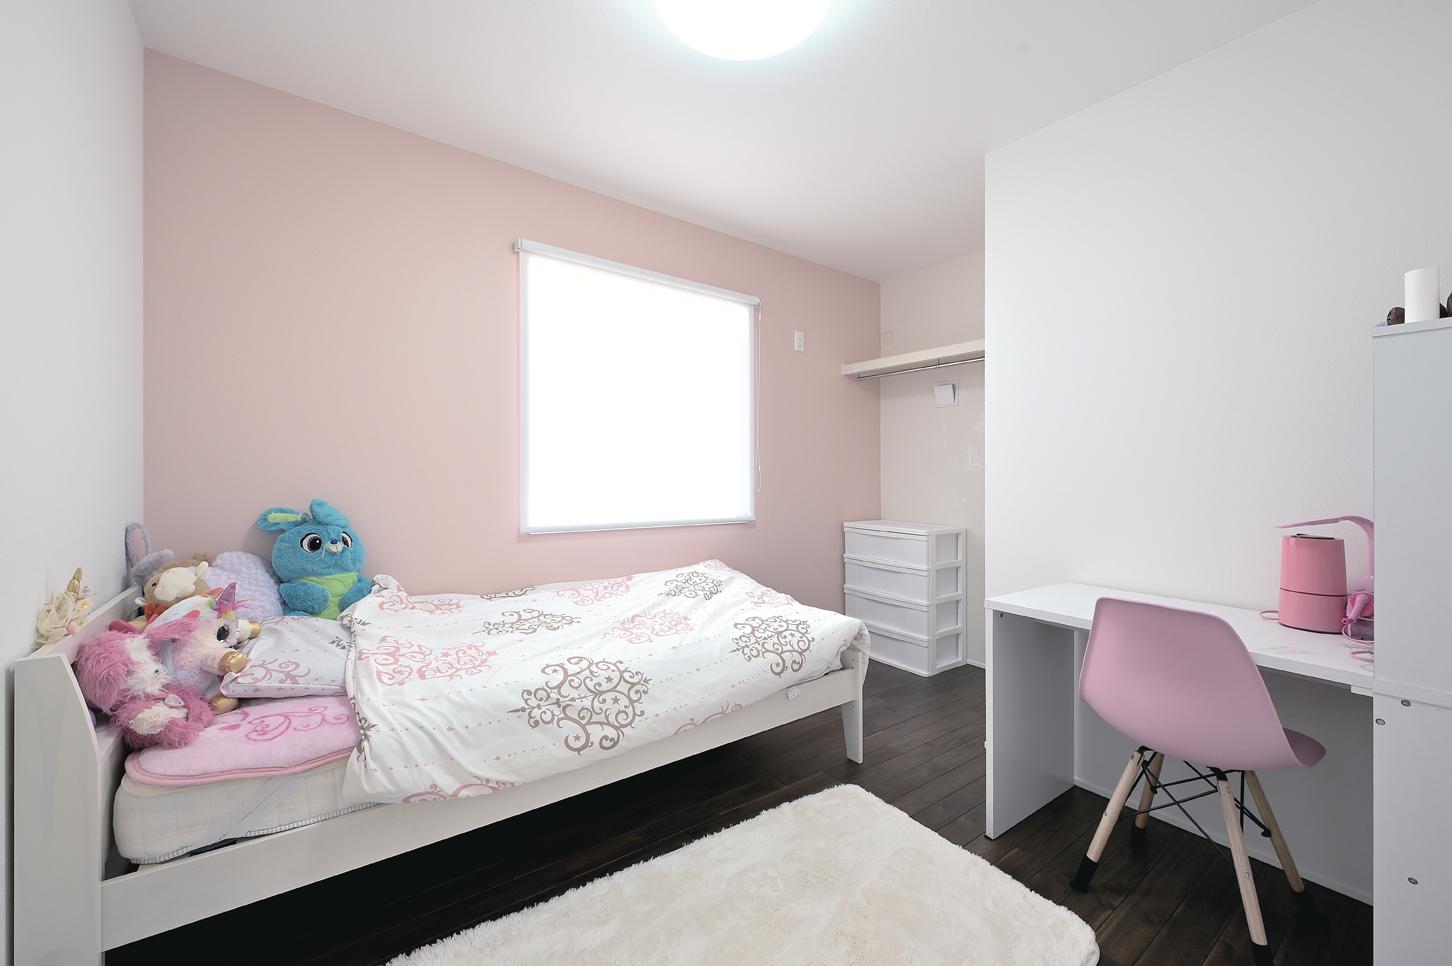 i.sus【子育て、省エネ、間取り】全館空調システムのおかげ。空気だけでなく床も暖かく、一年中素足で快適に過ごせる